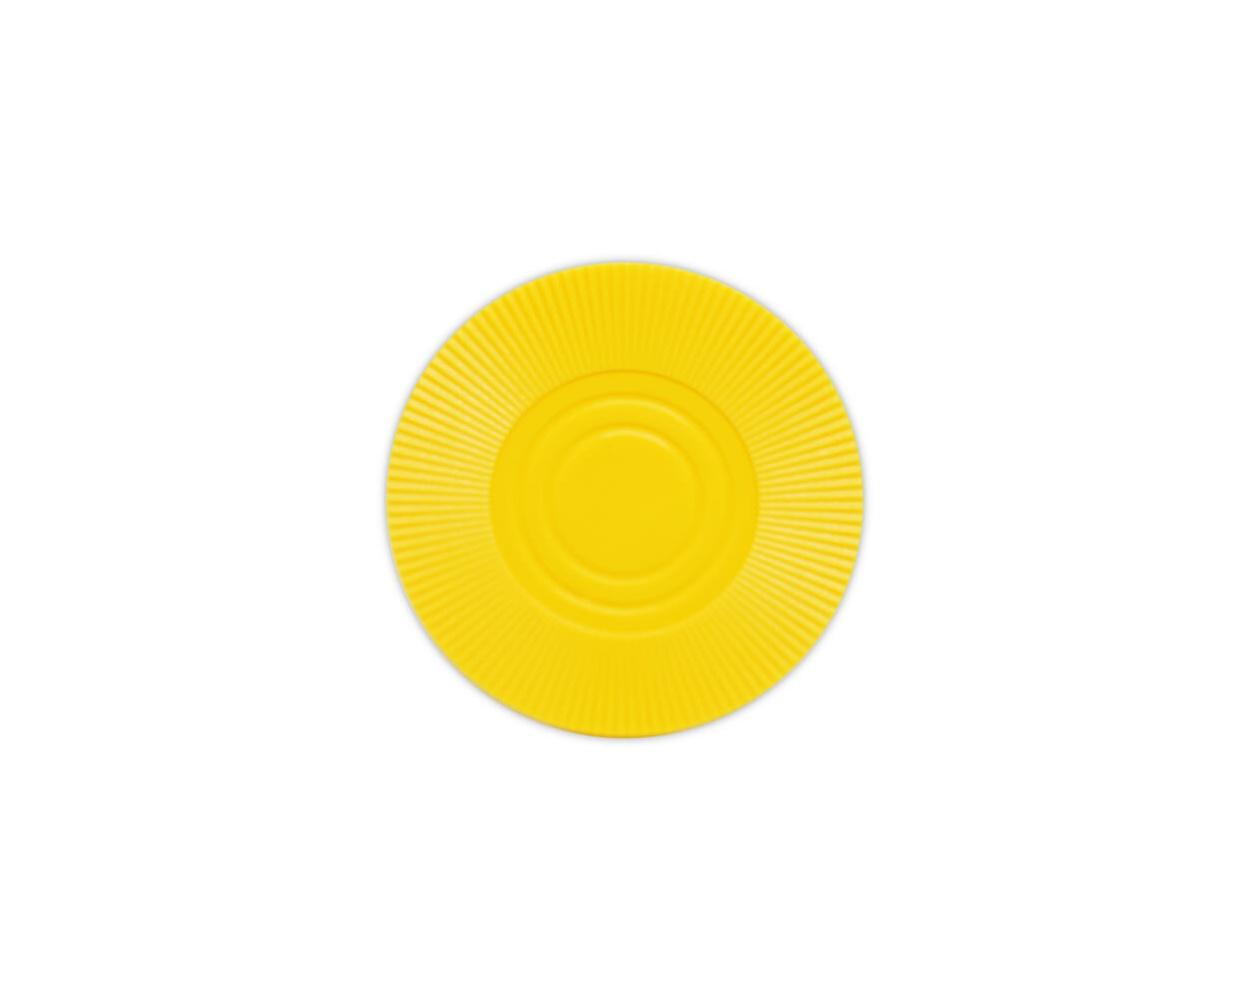 Radial Interlocking - Yellow Plastic Poker Chips